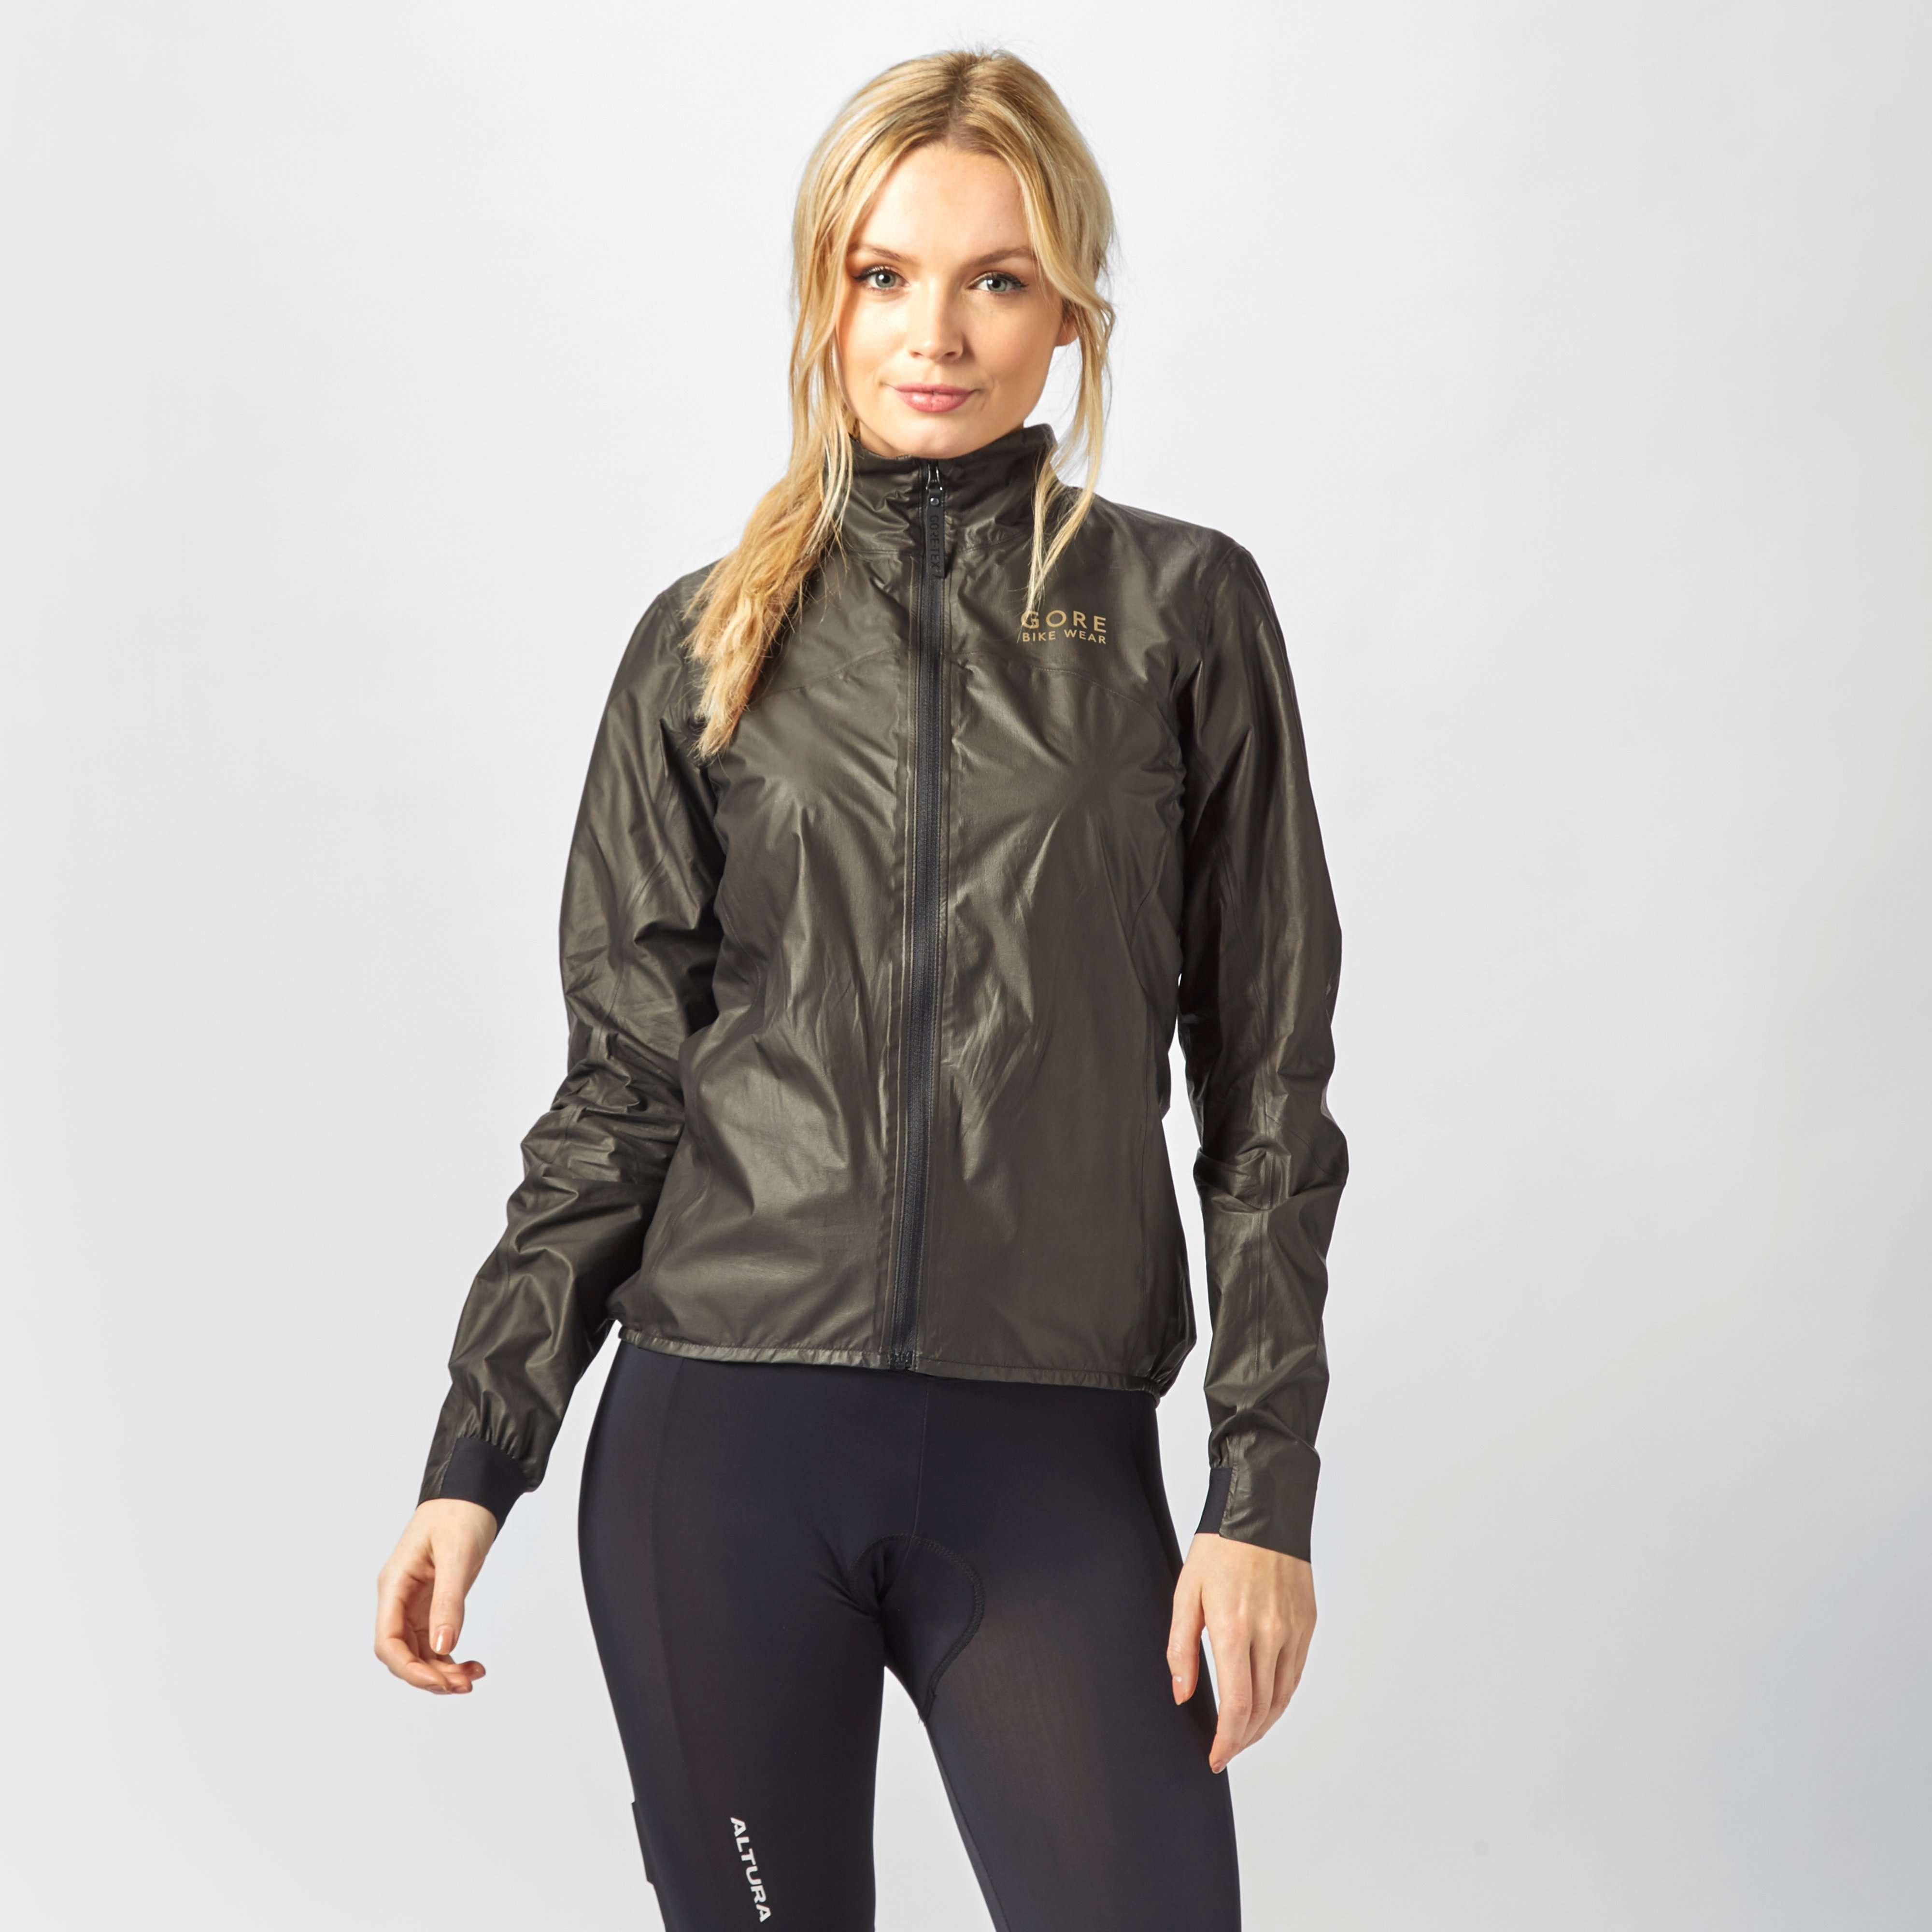 GORE Women's One GORE-TEX® Shakedry™ Jacket